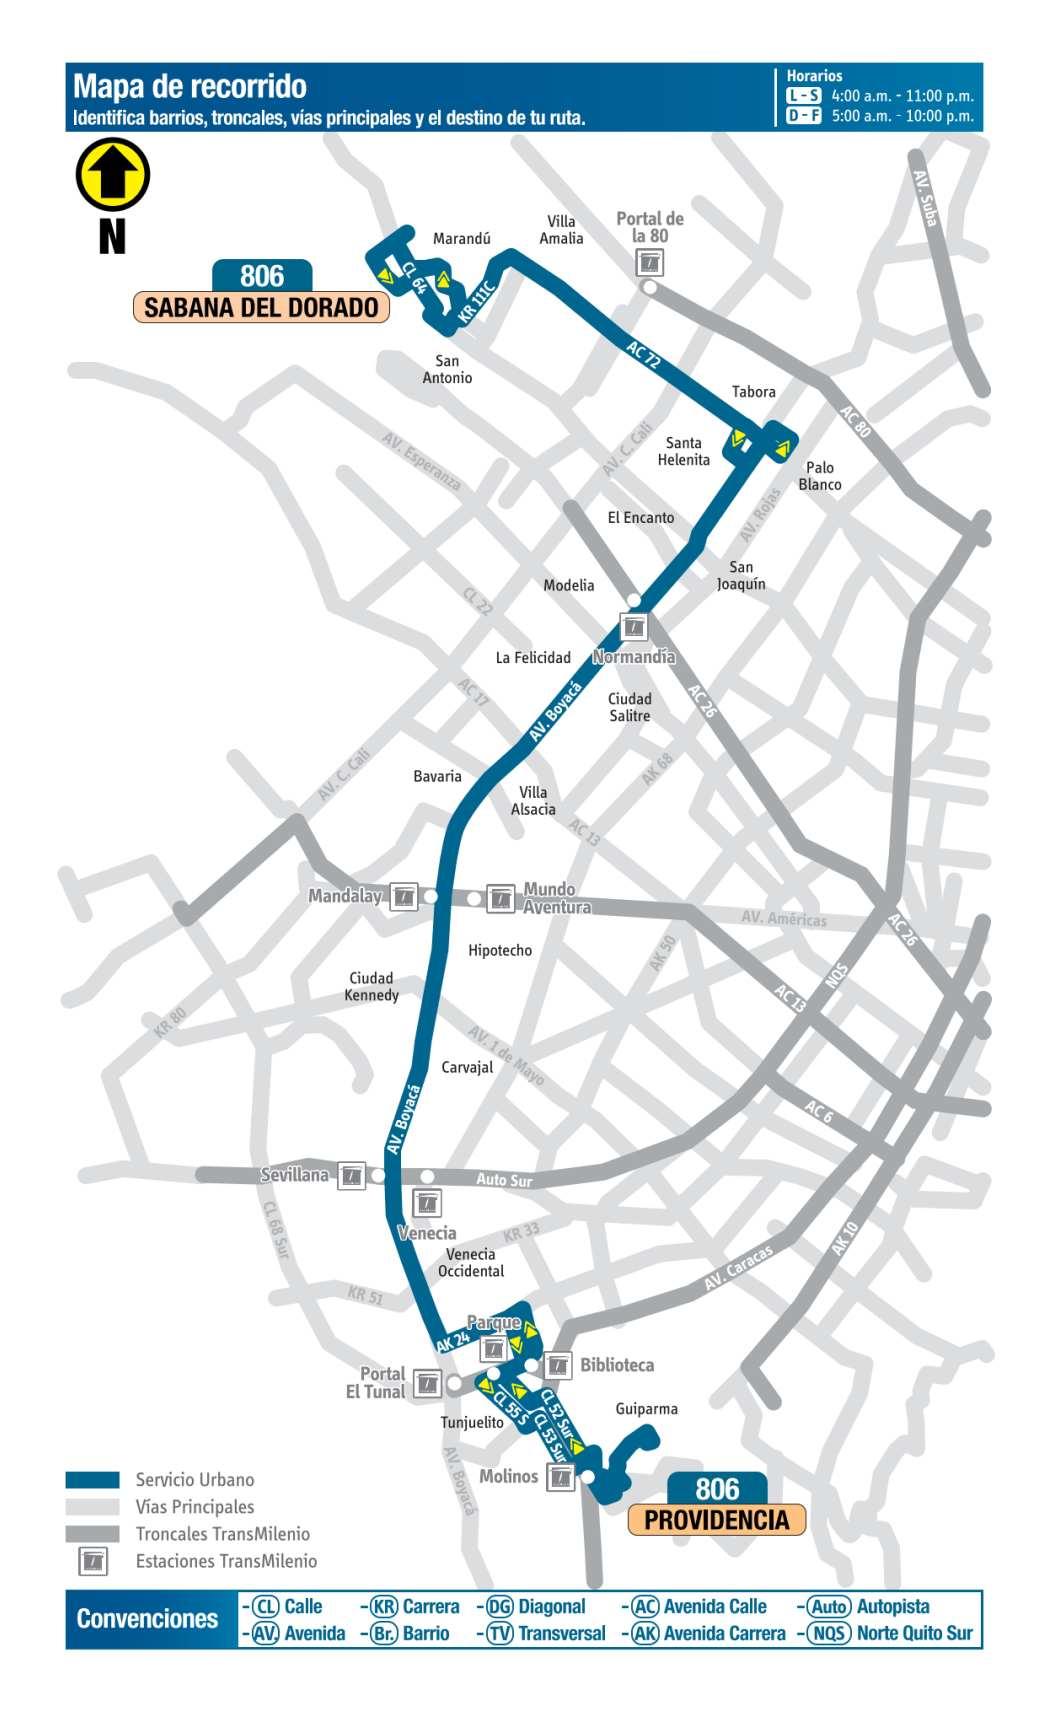 806 Sabana del Dorado - Providencia, mapa bus urbano Bogotá